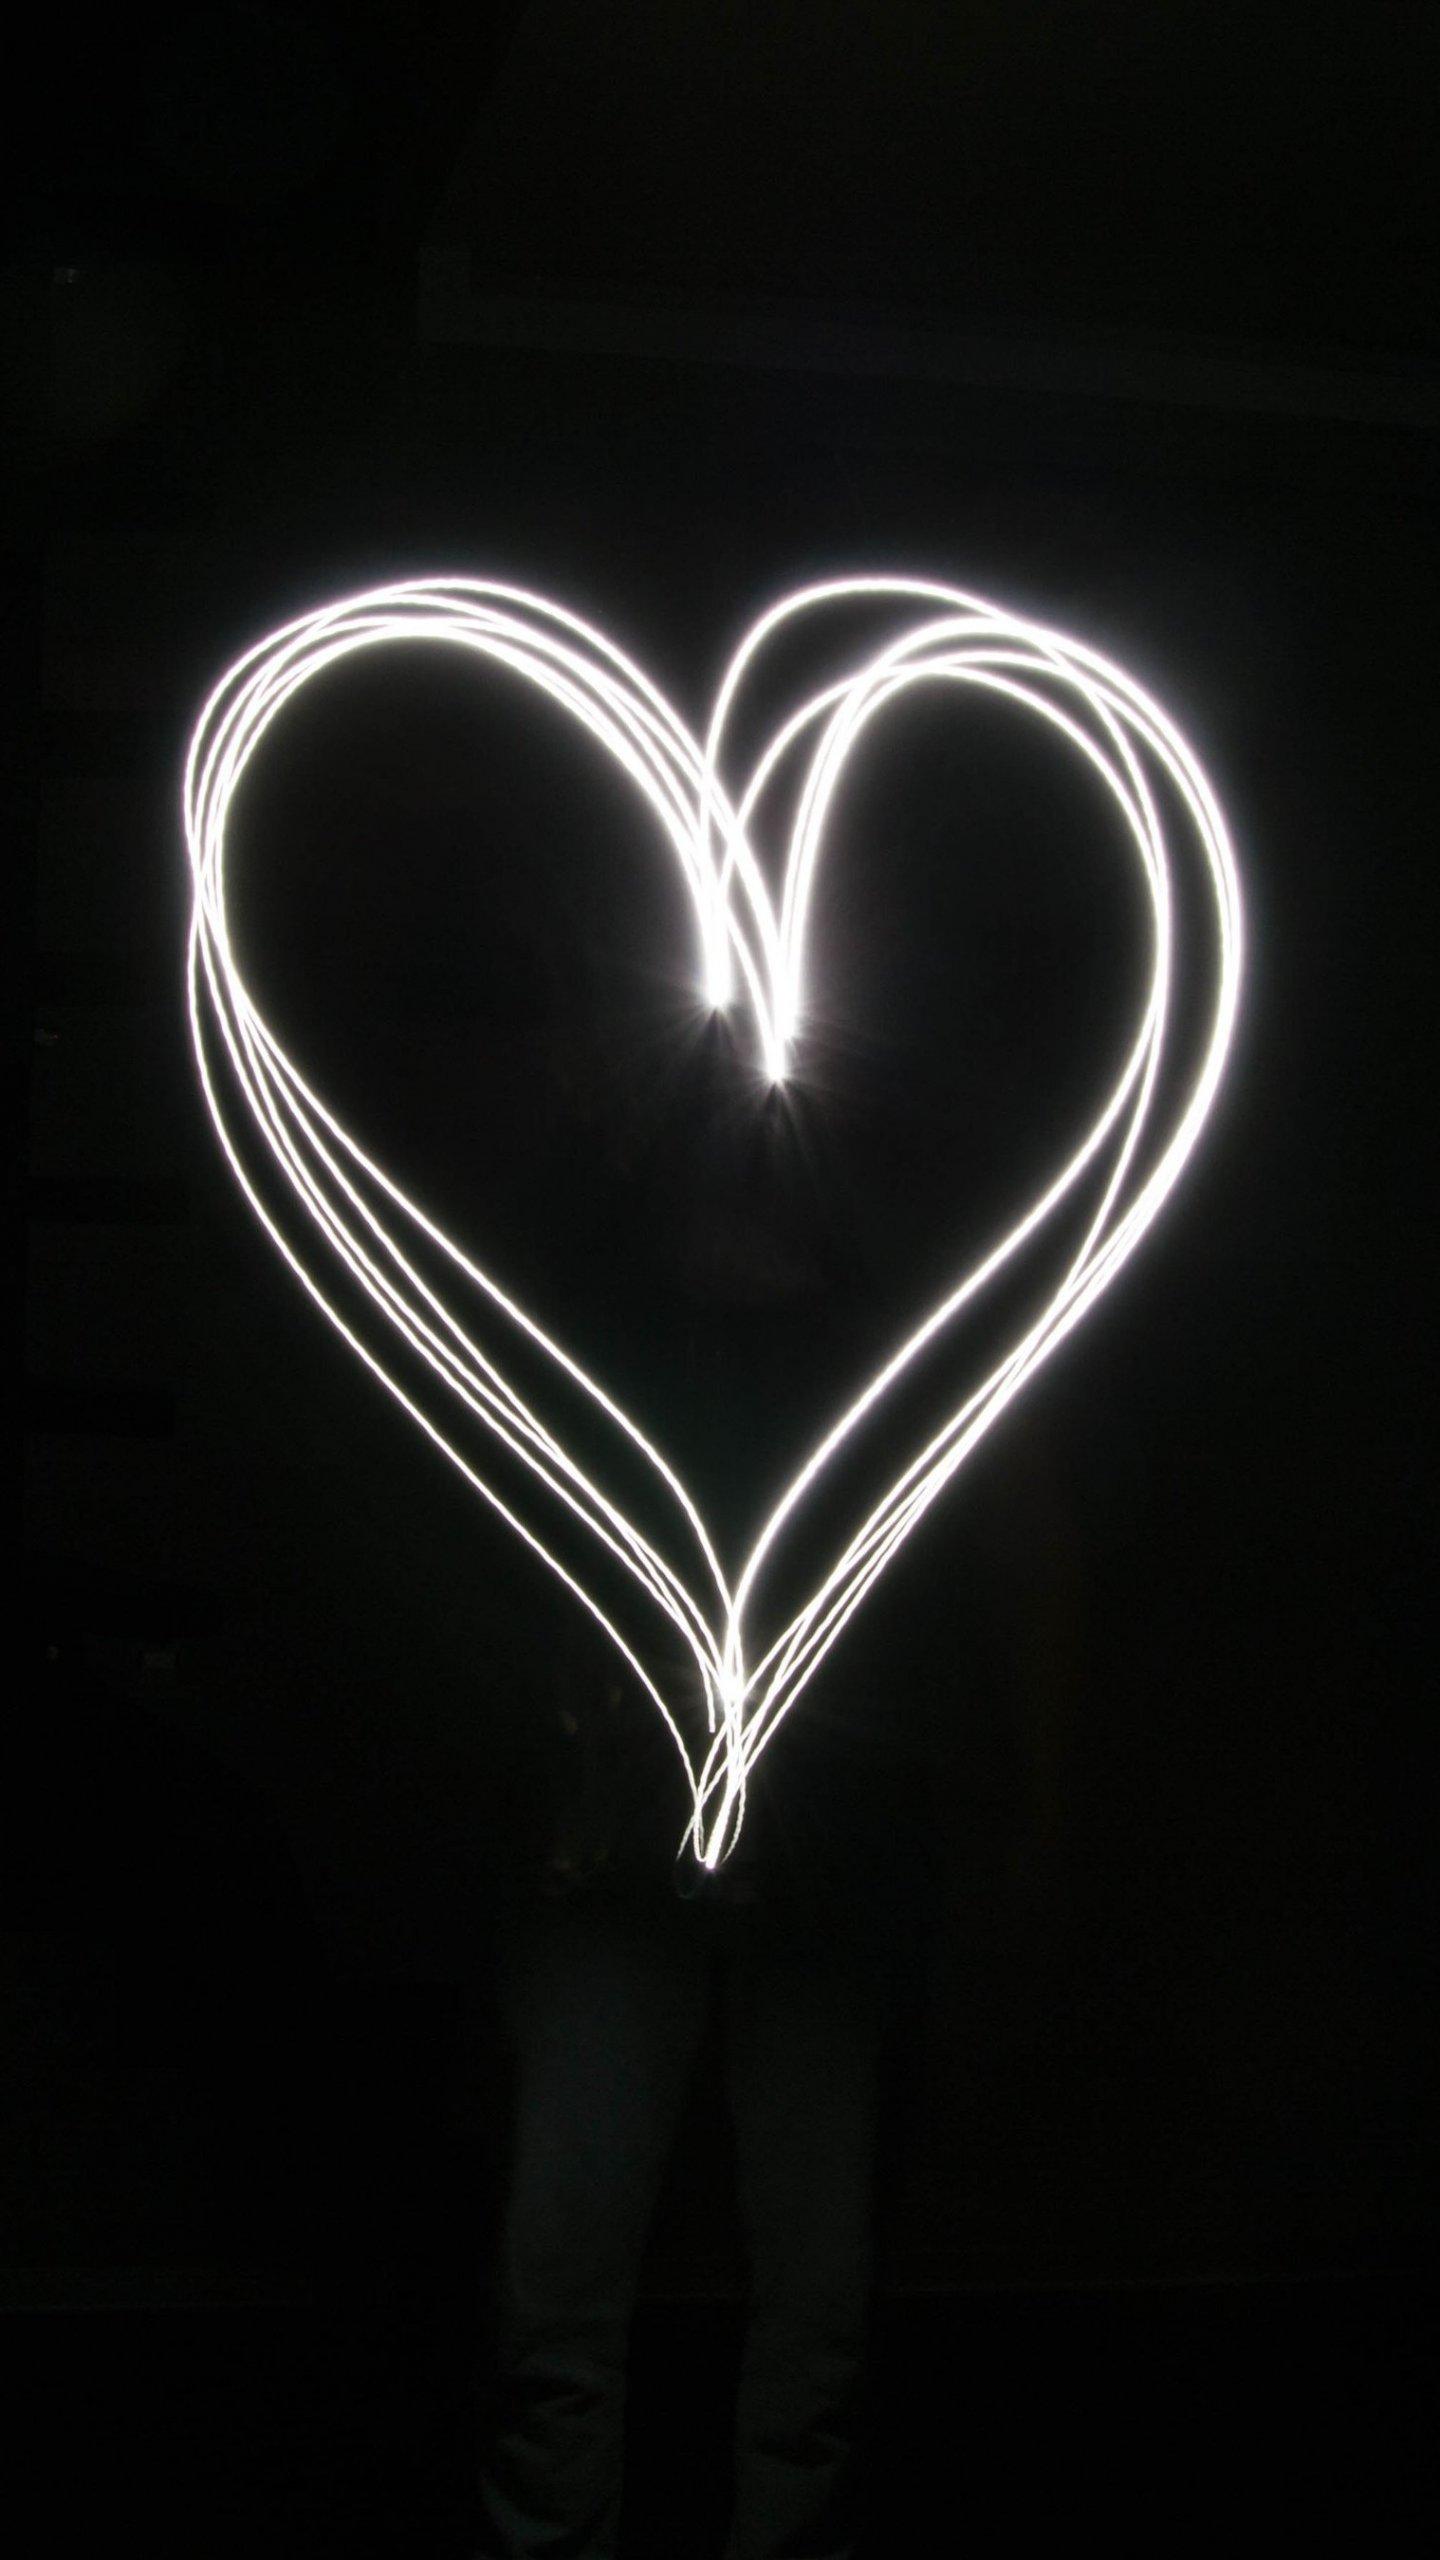 Light Heart Wallpaper   iPhone Android Desktop Backgrounds 1440x2560